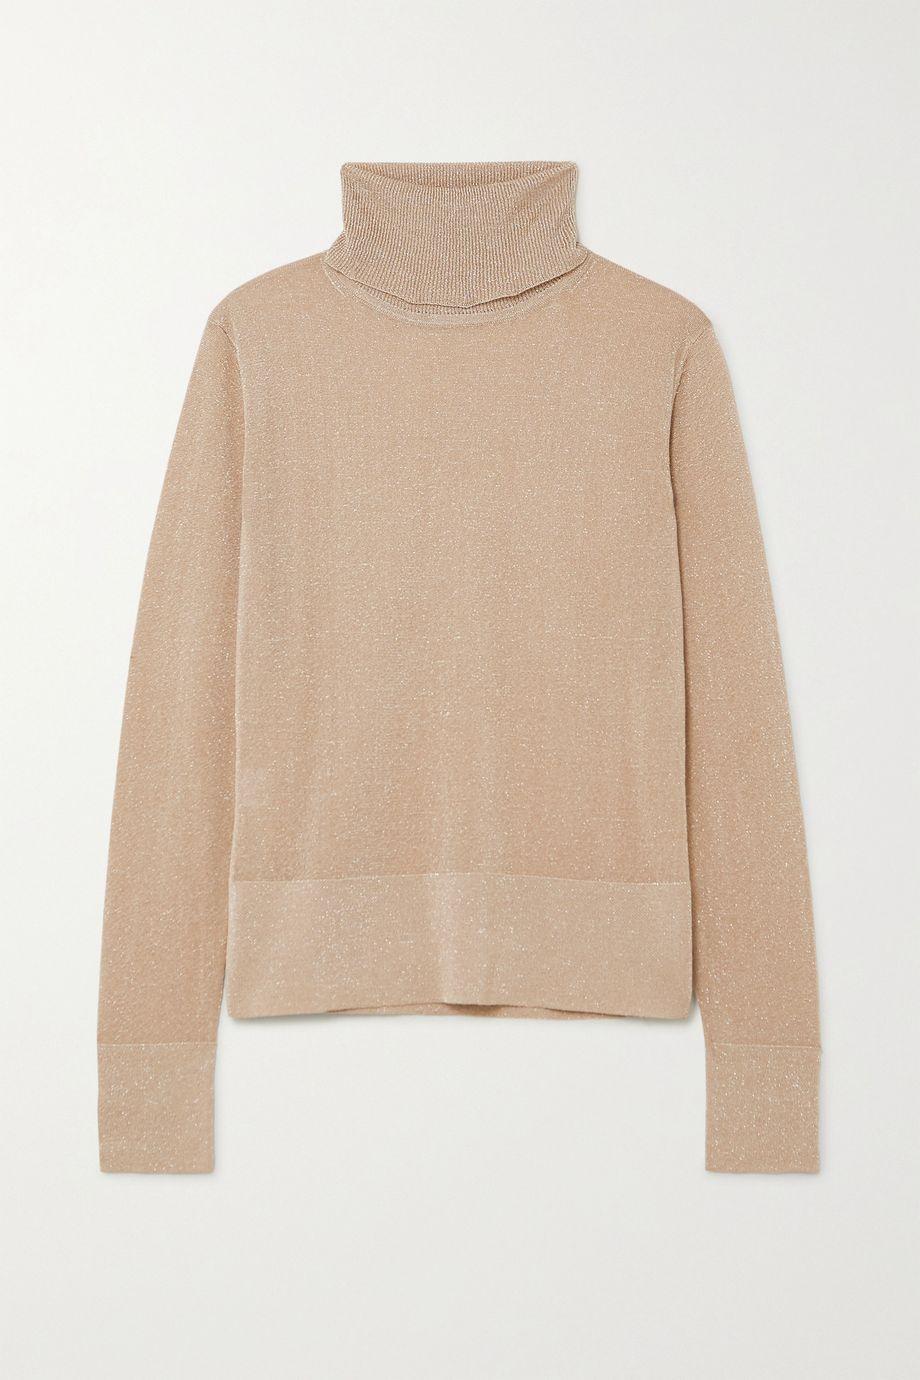 Altuzarra Lexia metallic knitted turtleneck sweater